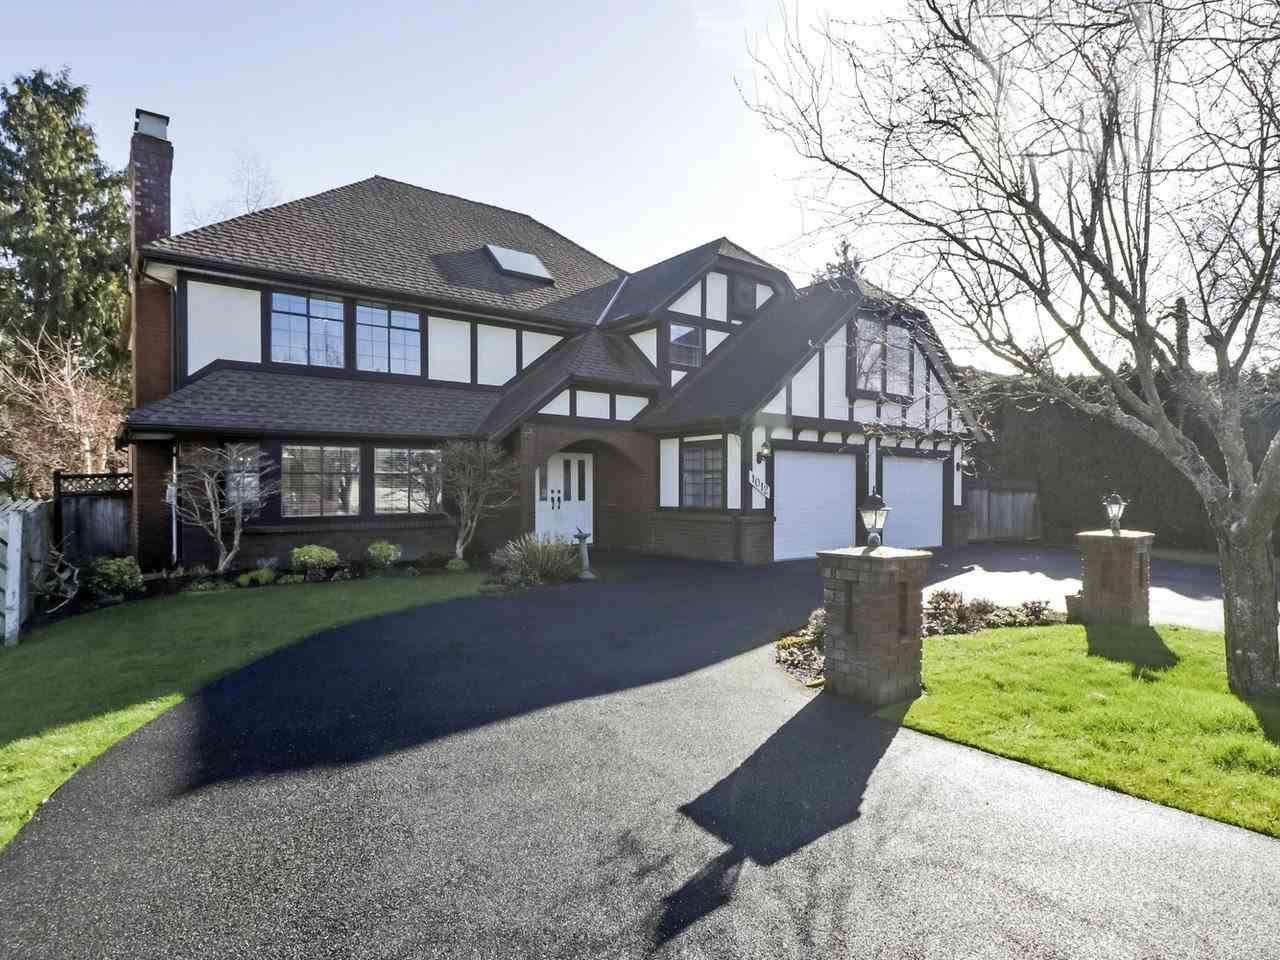 Main Photo: 1012 51 STREET in : Tsawwassen Central House for sale : MLS®# R2437309